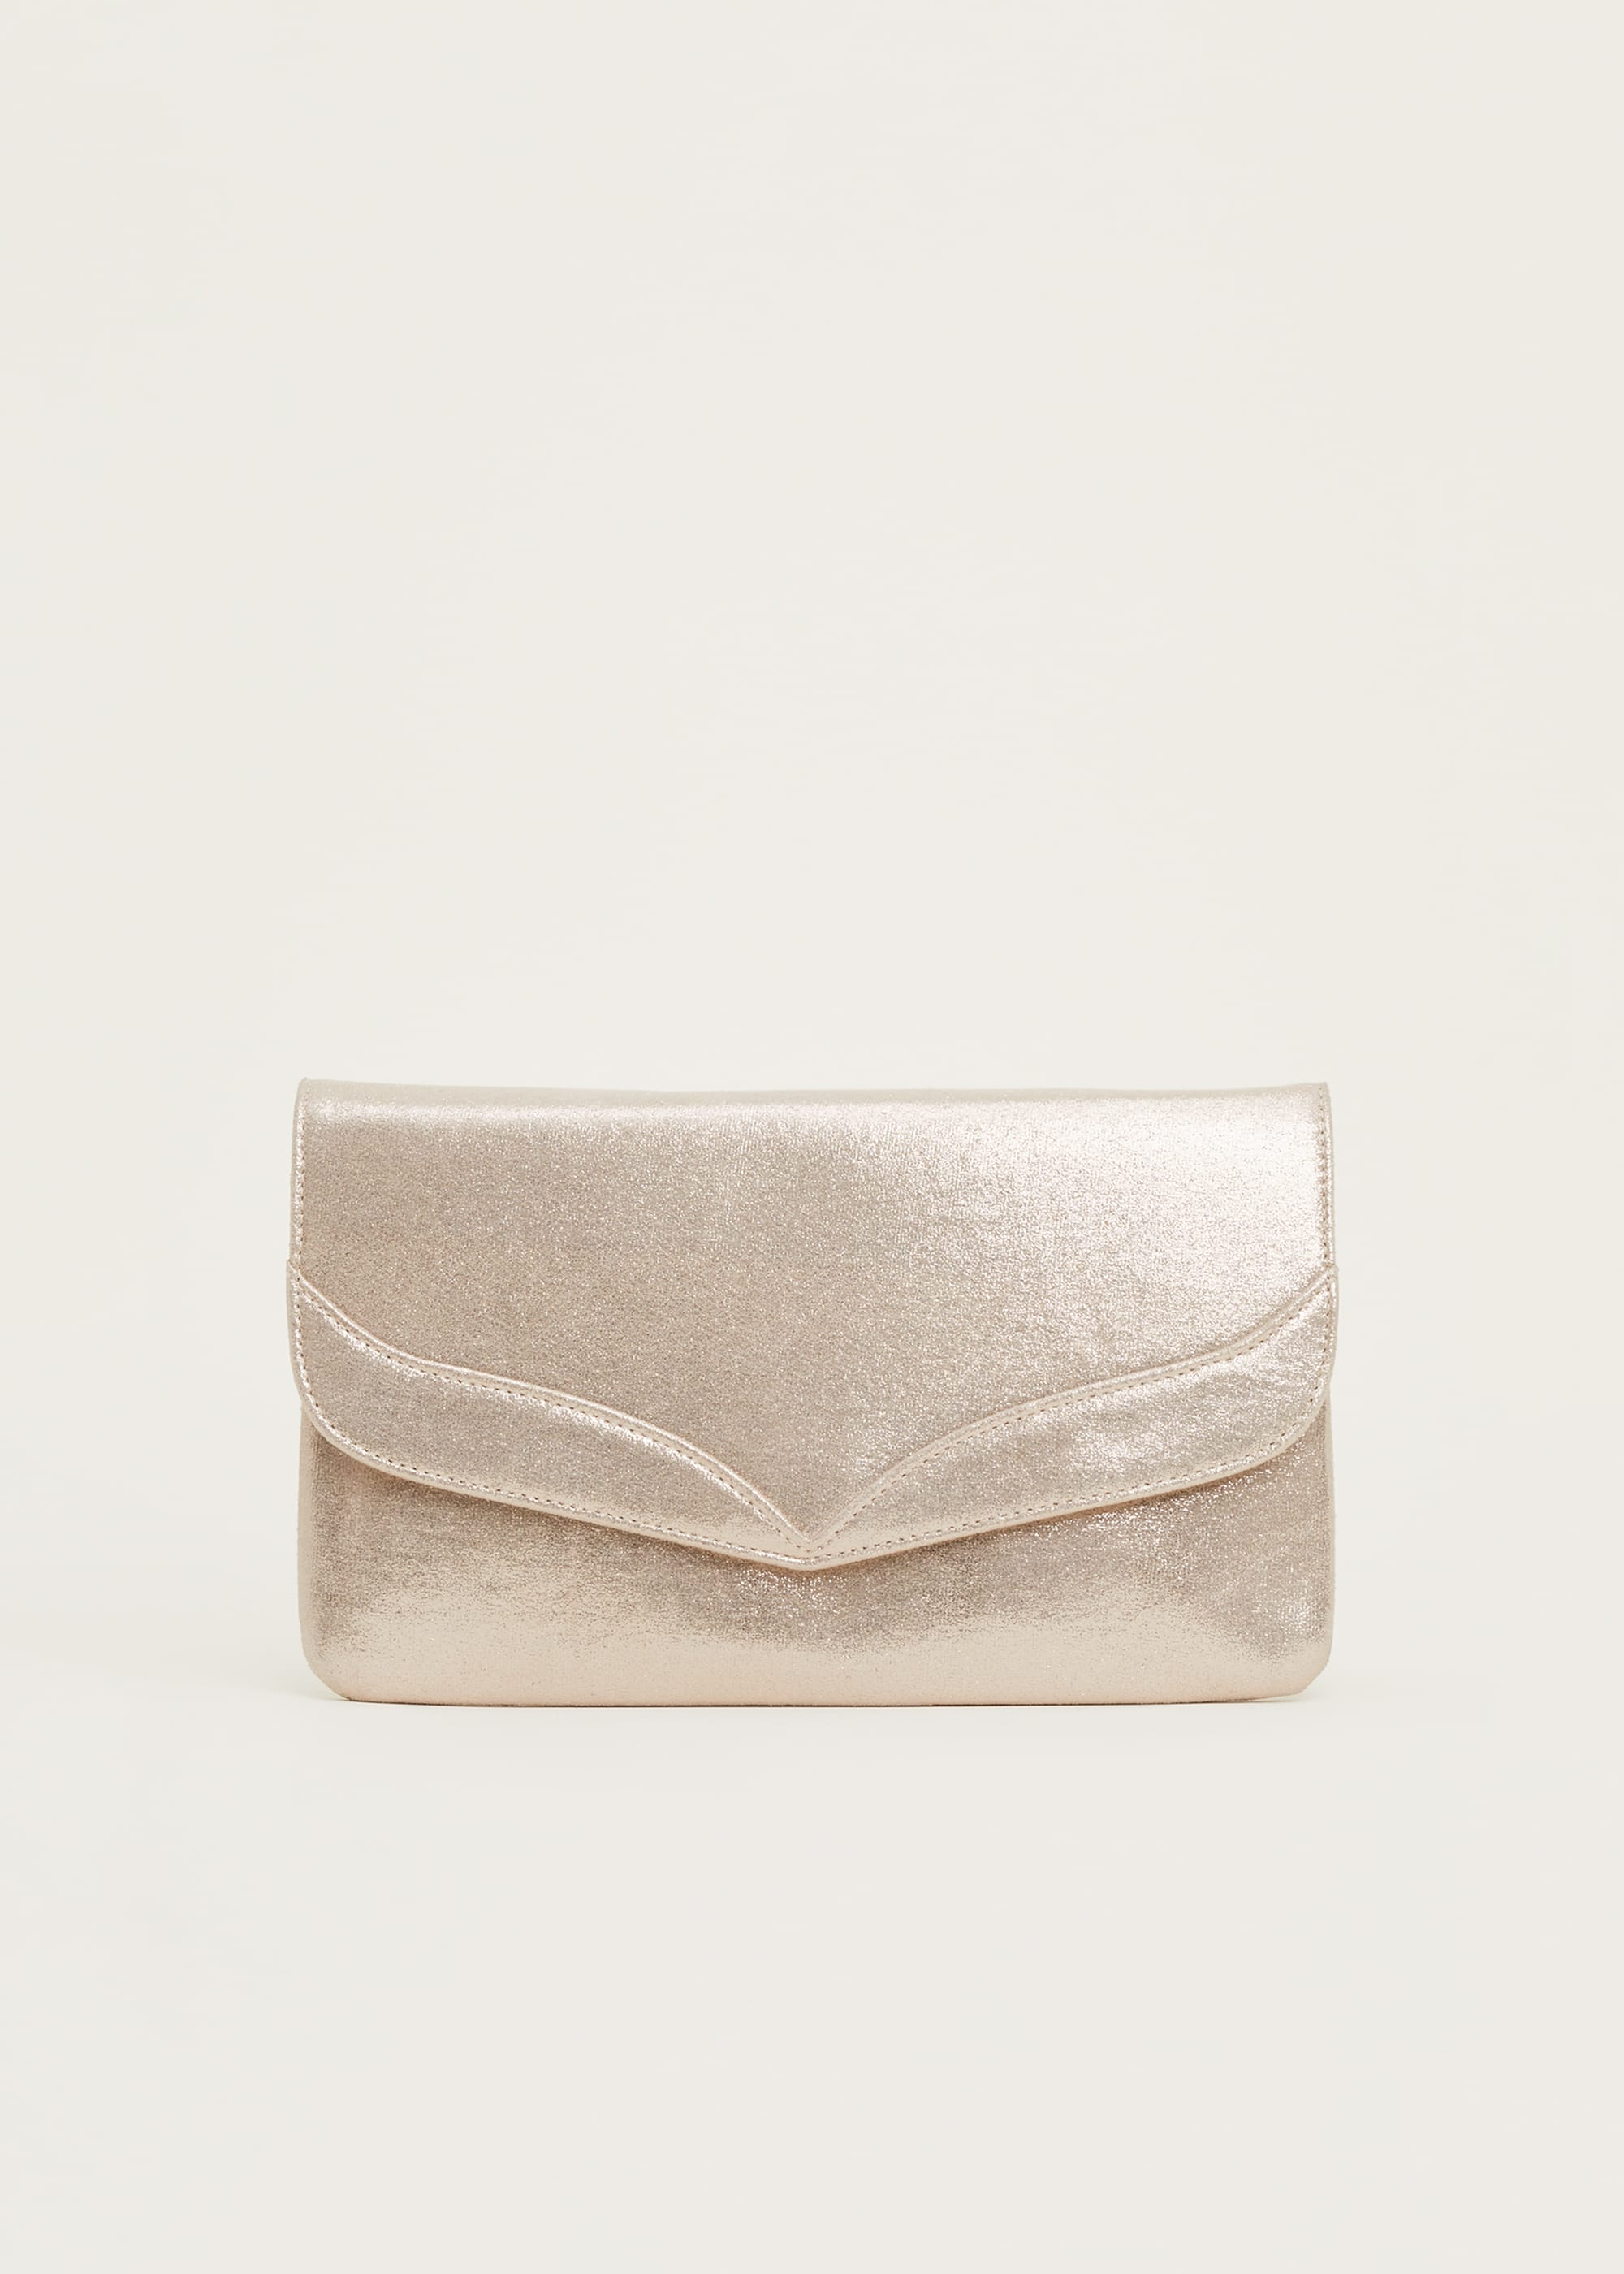 Phase Eight Women Caitlin Metallic Clutch Bag